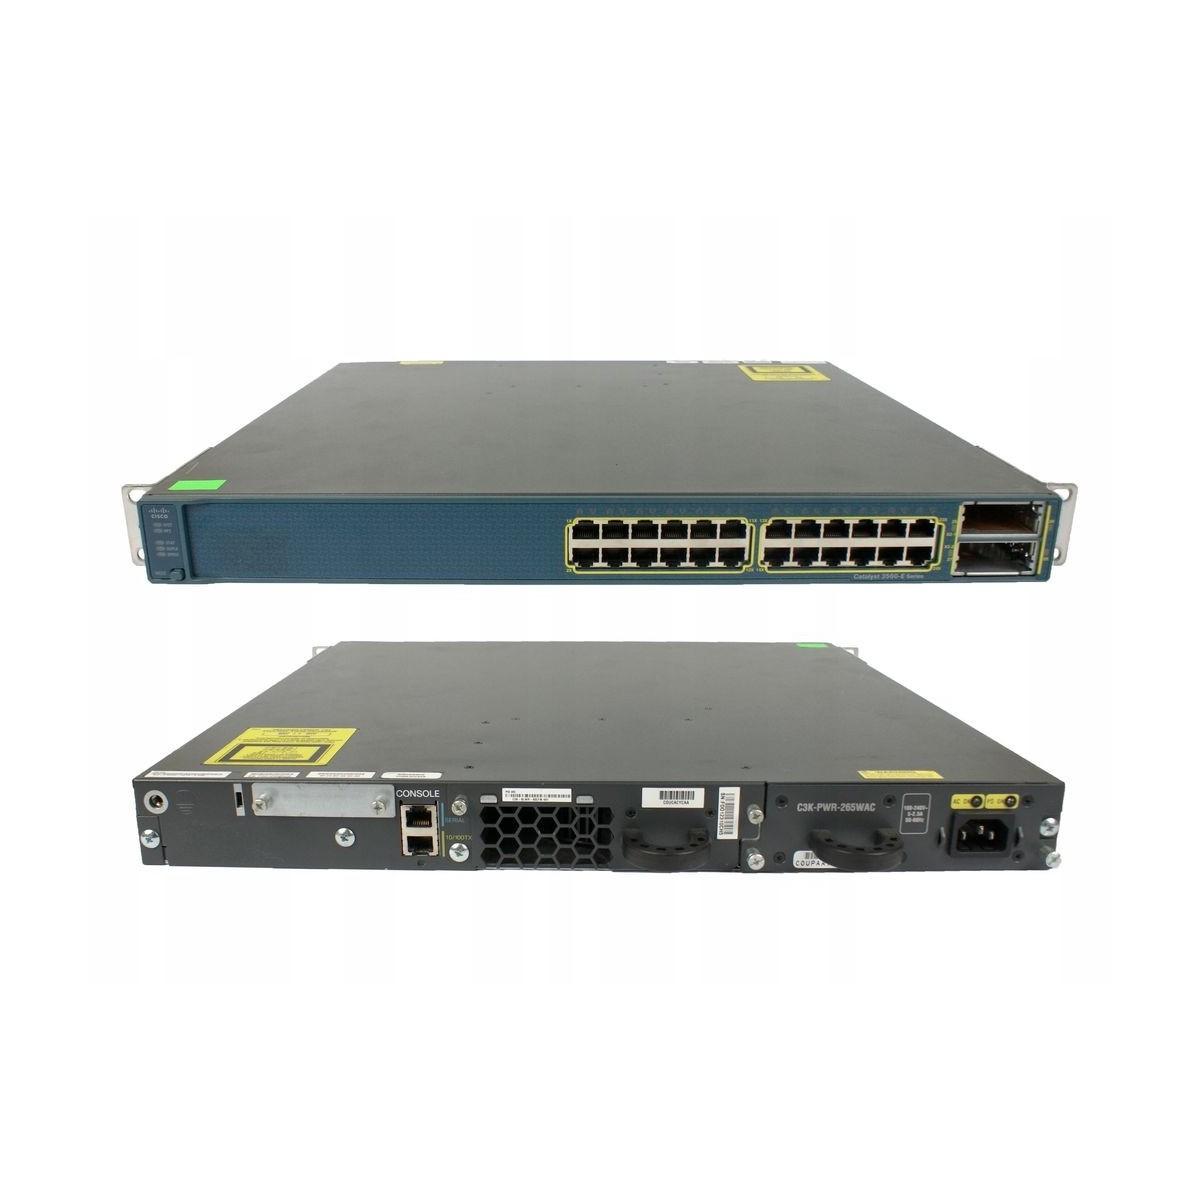 HP DL585 G6 4x2,40 SIX AMD 128GB 3x1TB SAS